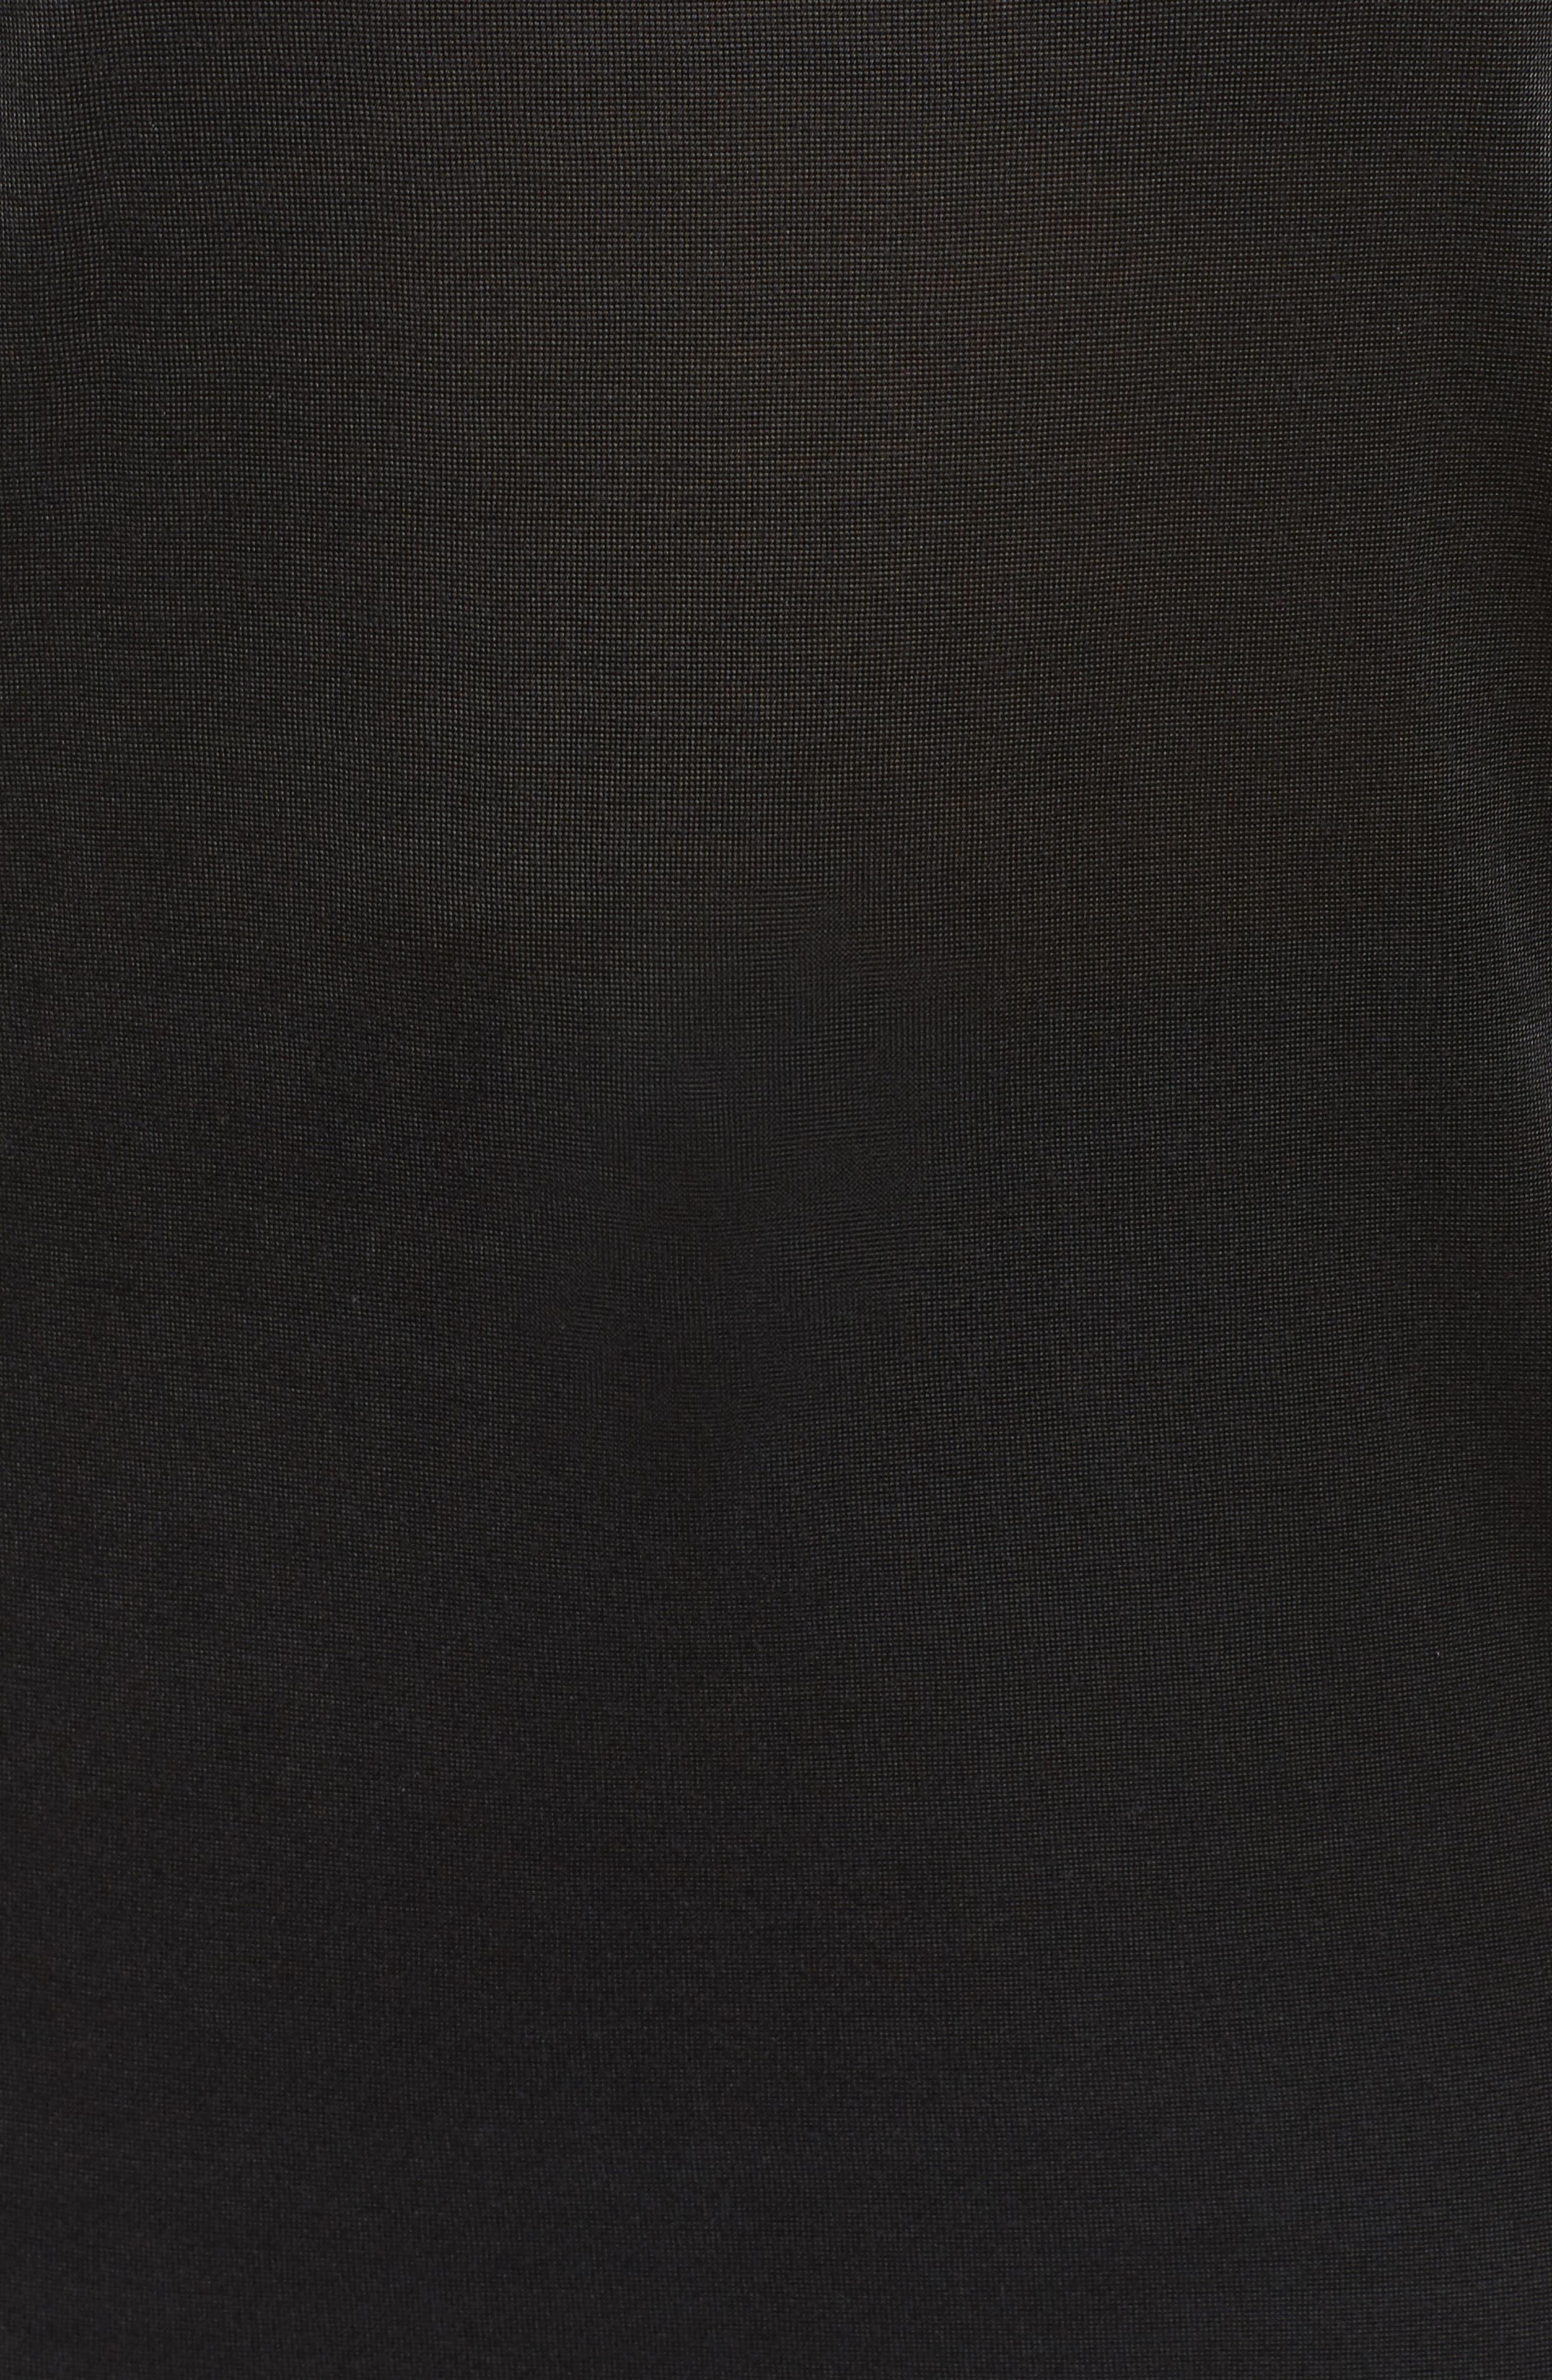 Slit Sleeve Top,                             Alternate thumbnail 6, color,                             Black